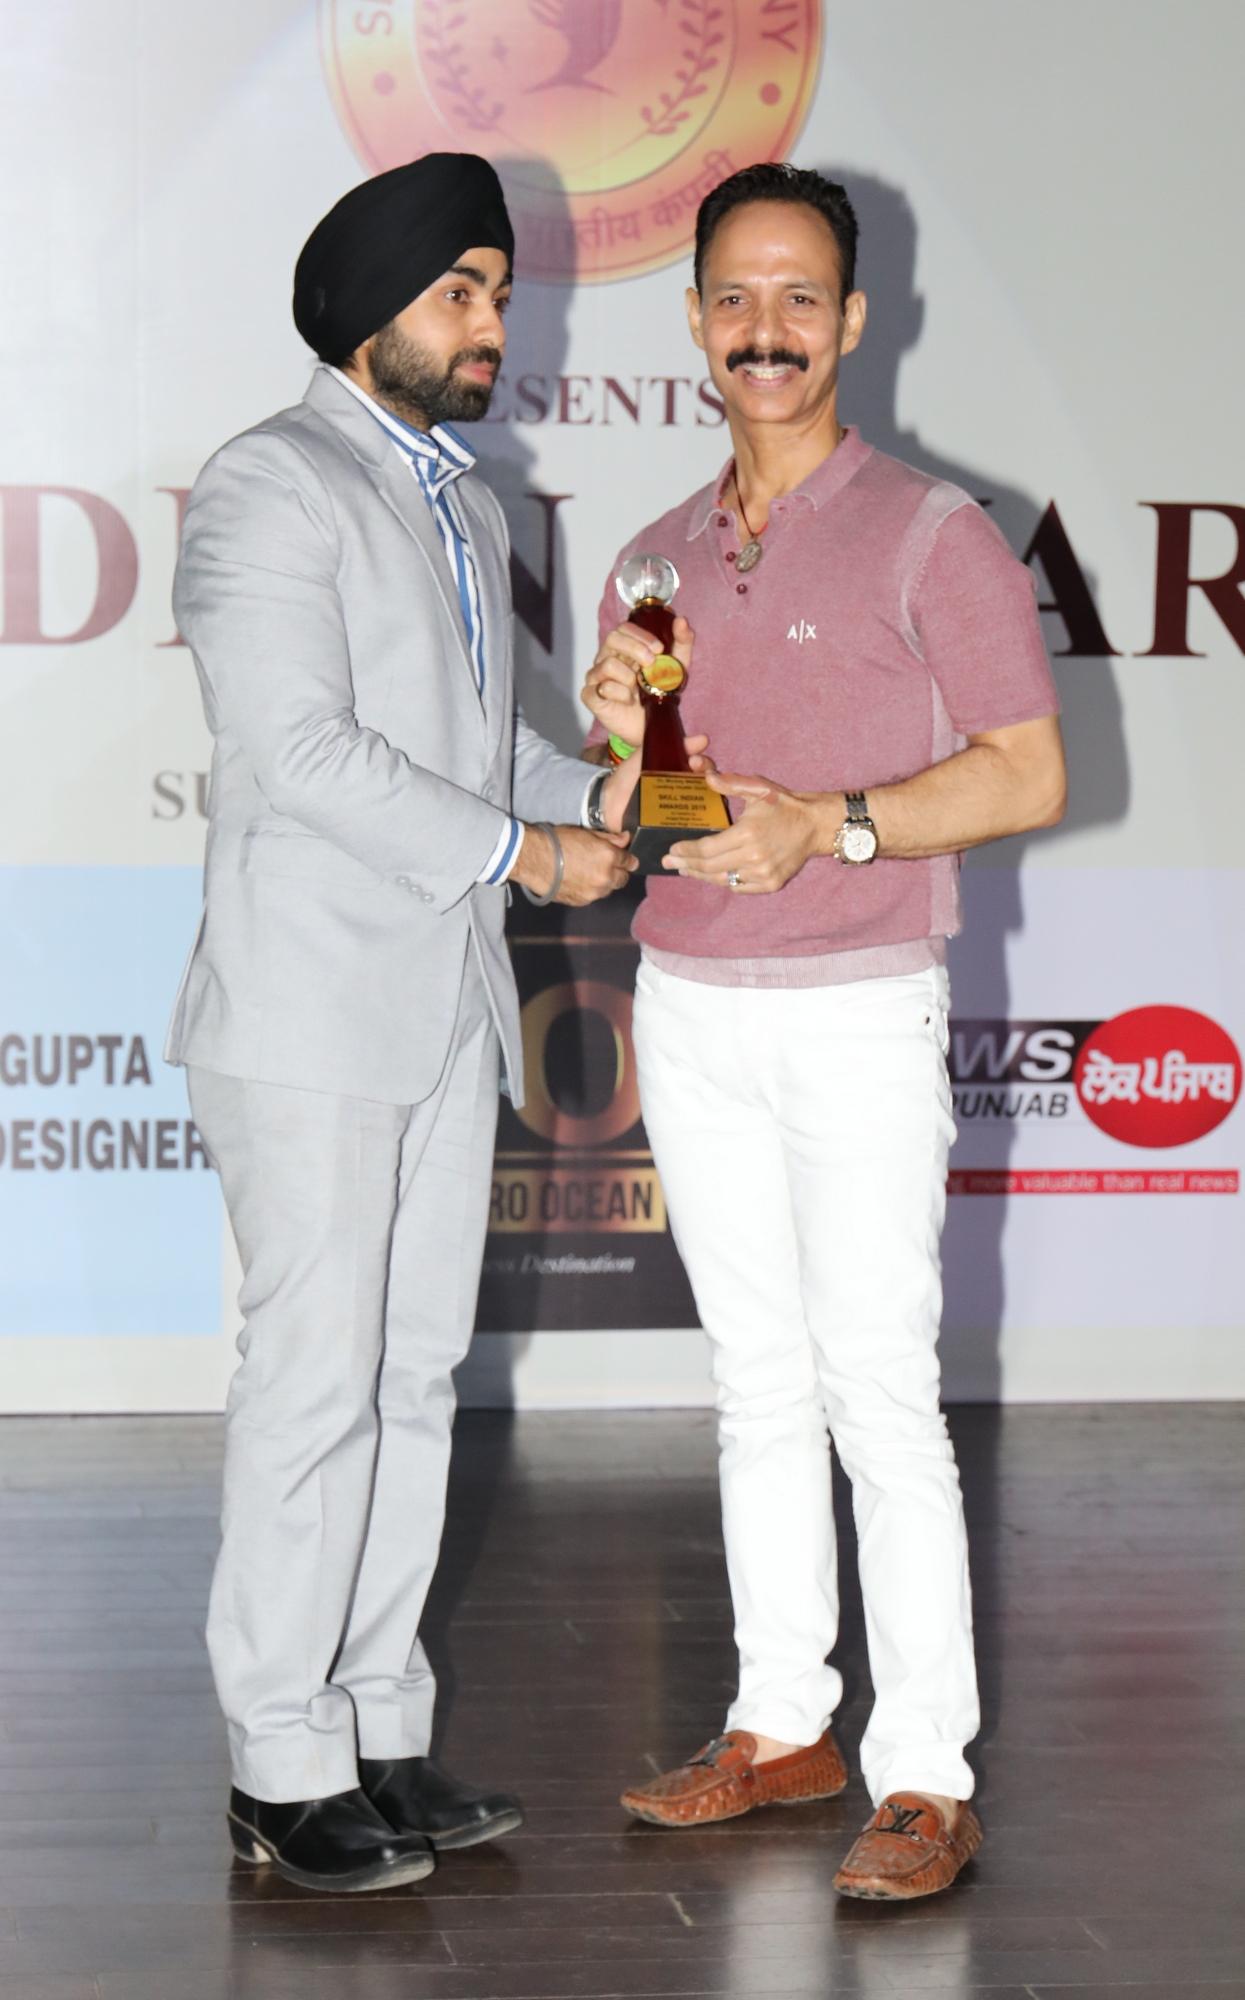 9. Angad Singh Arora - Managing Director Skill Indian Company awarding Mickey Contractor AMP_8281